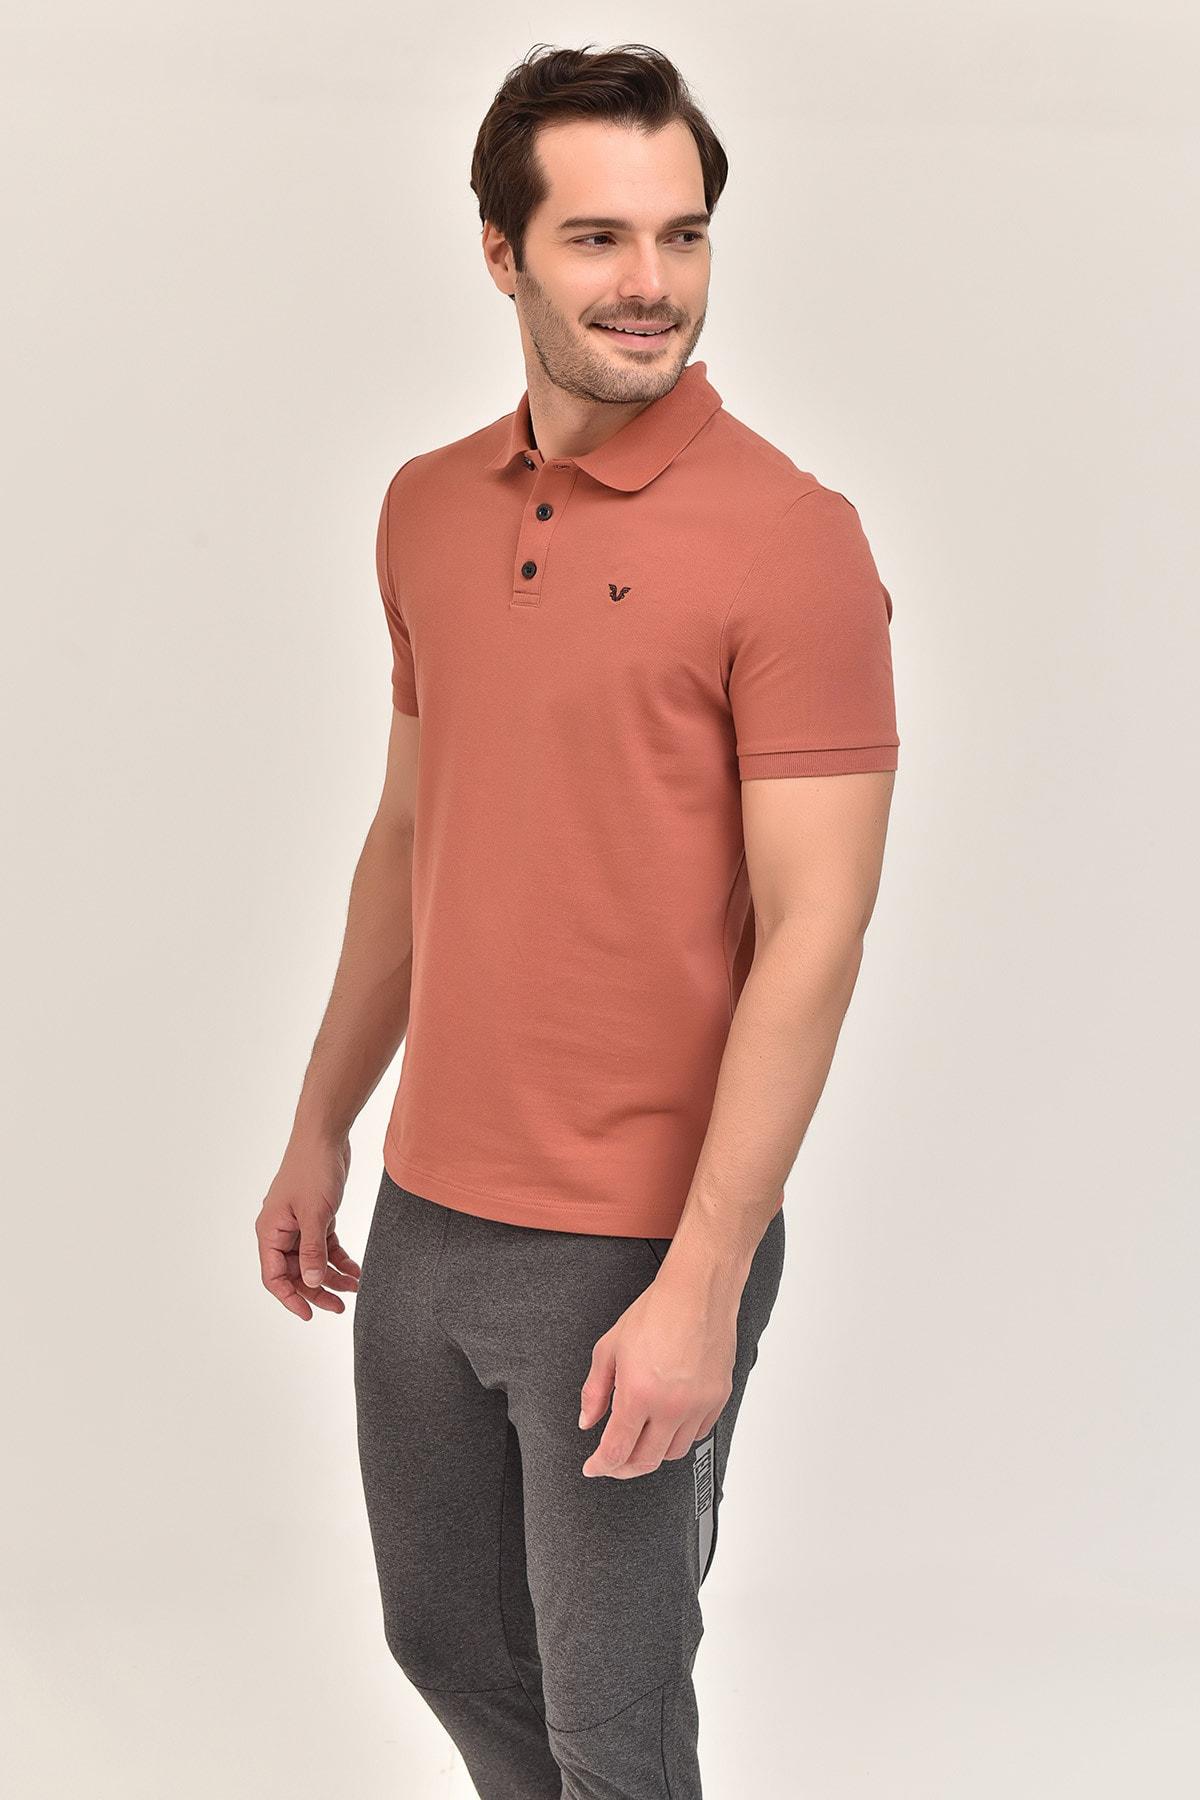 bilcee Kahverengi Erkek T-Shirt GS-8982 2